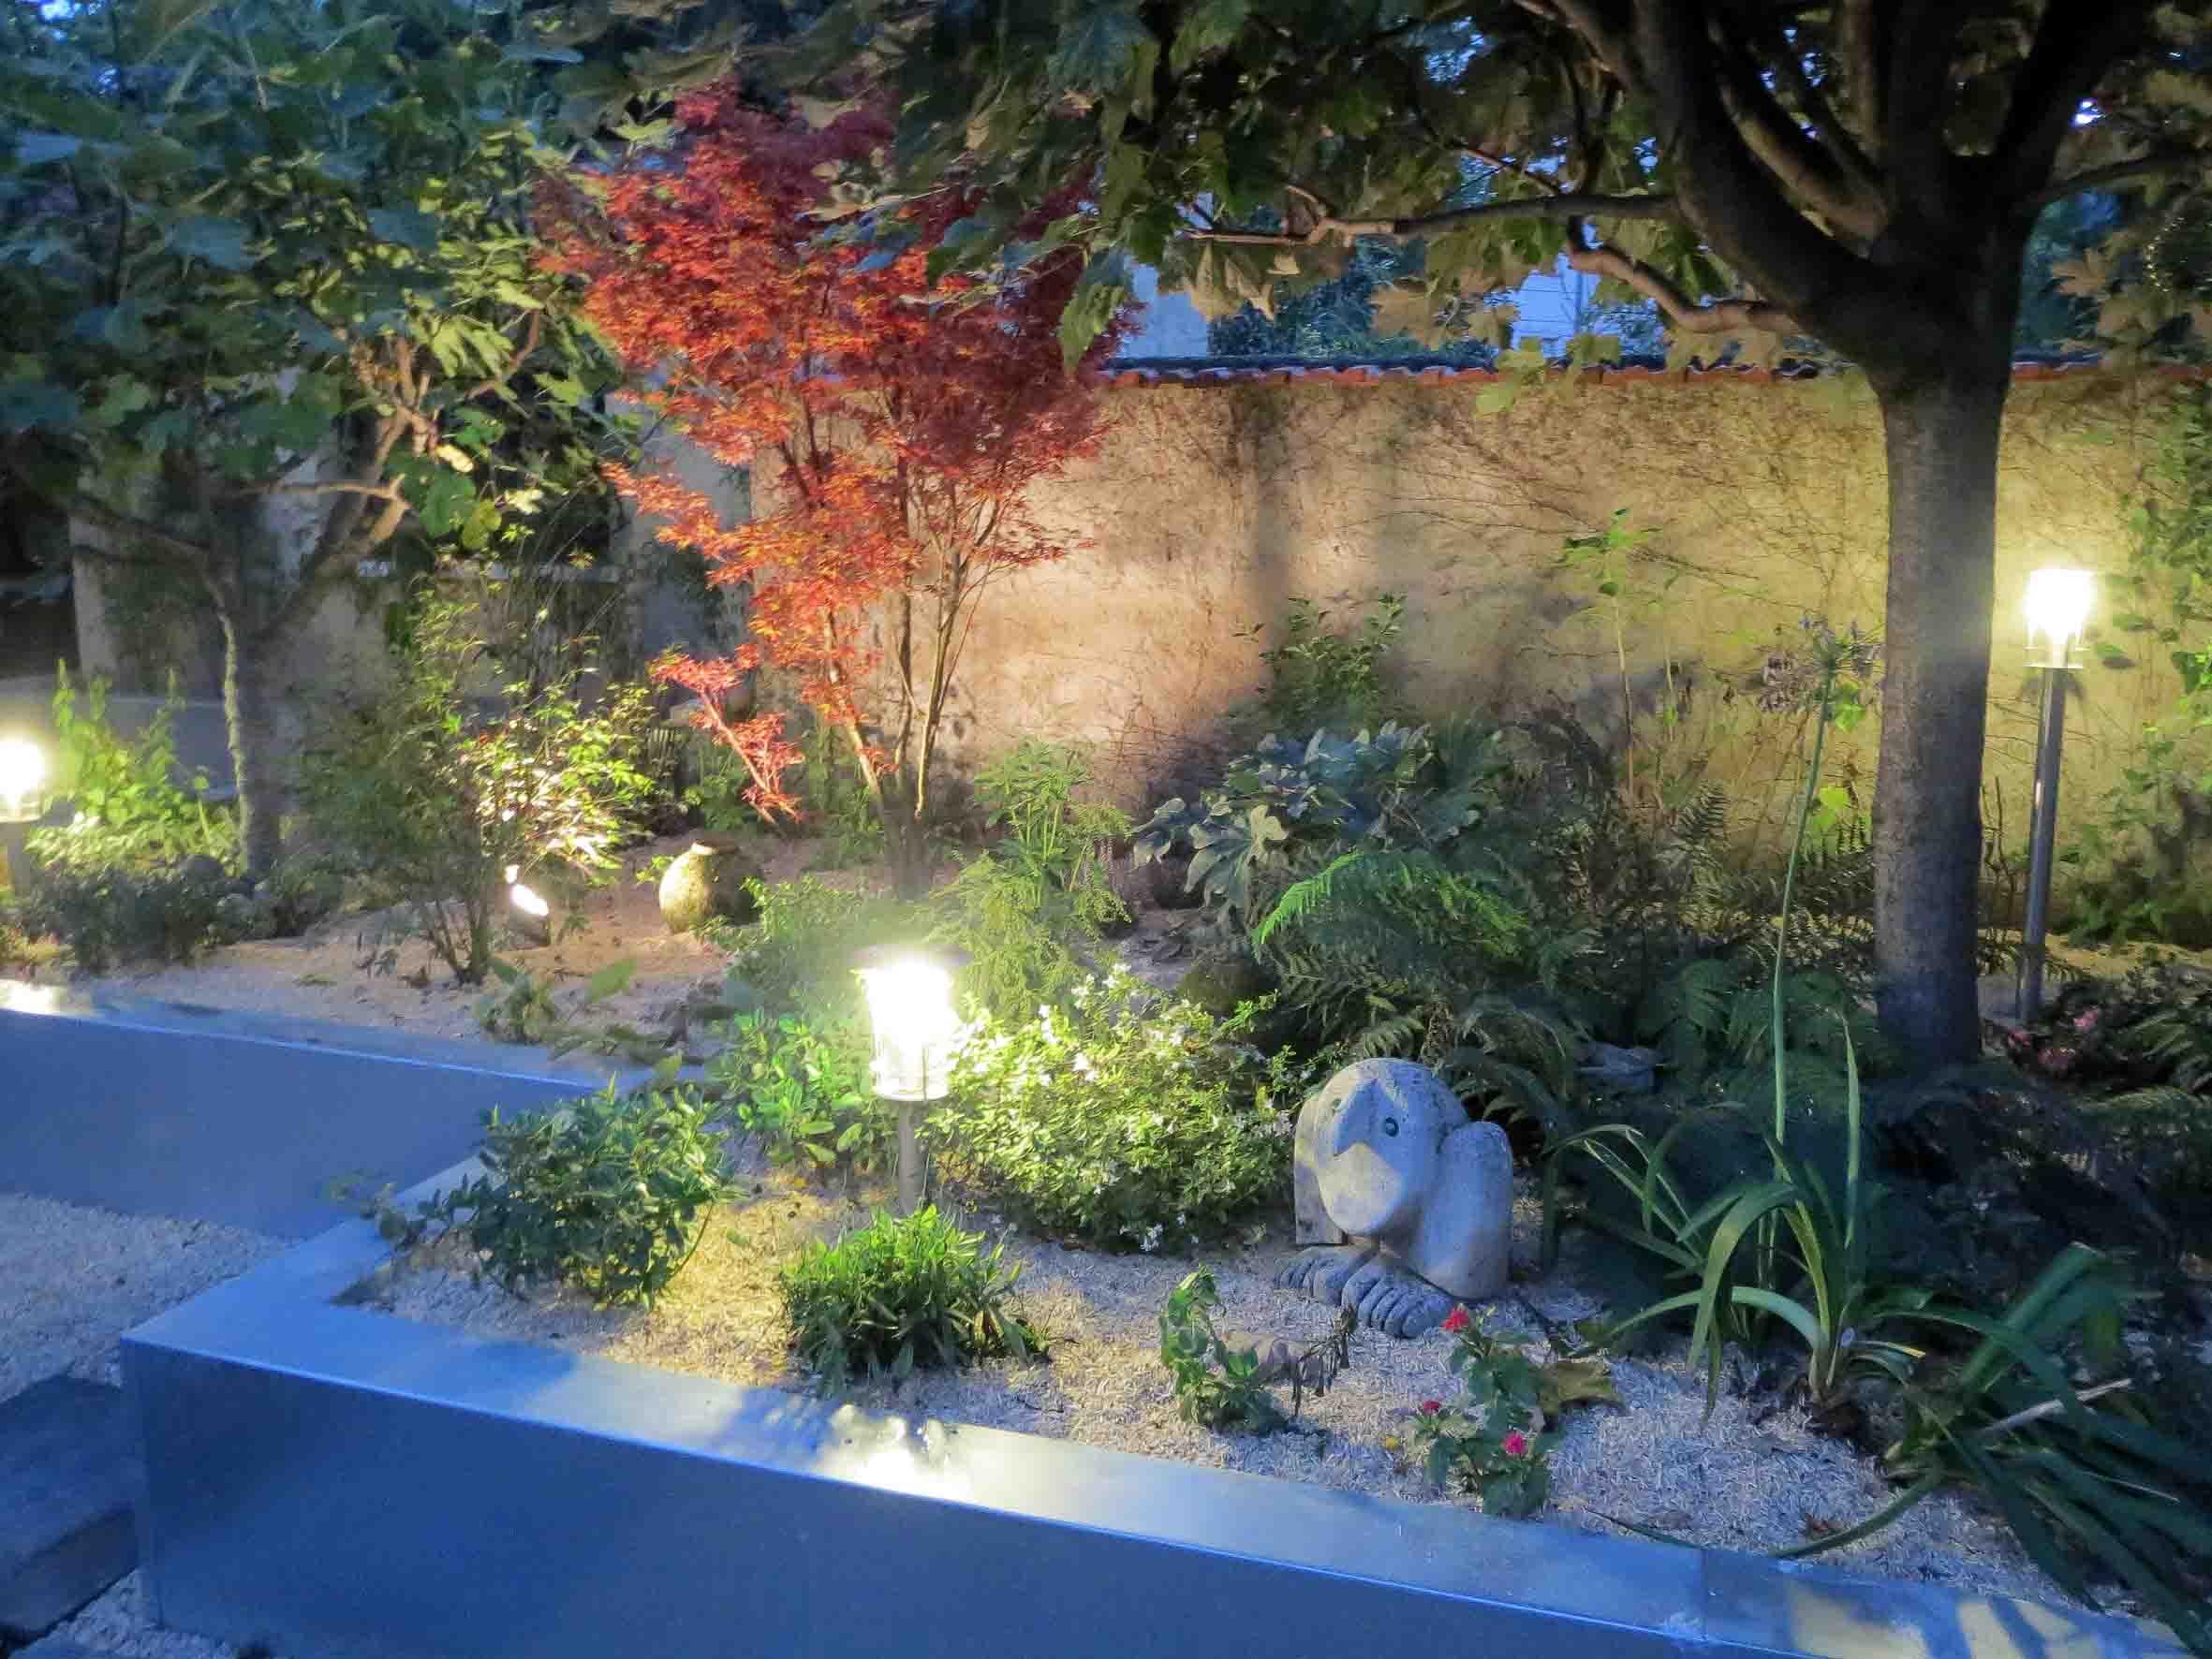 3 conseils pour r ussir son accueil au jardin jardinier conseil. Black Bedroom Furniture Sets. Home Design Ideas